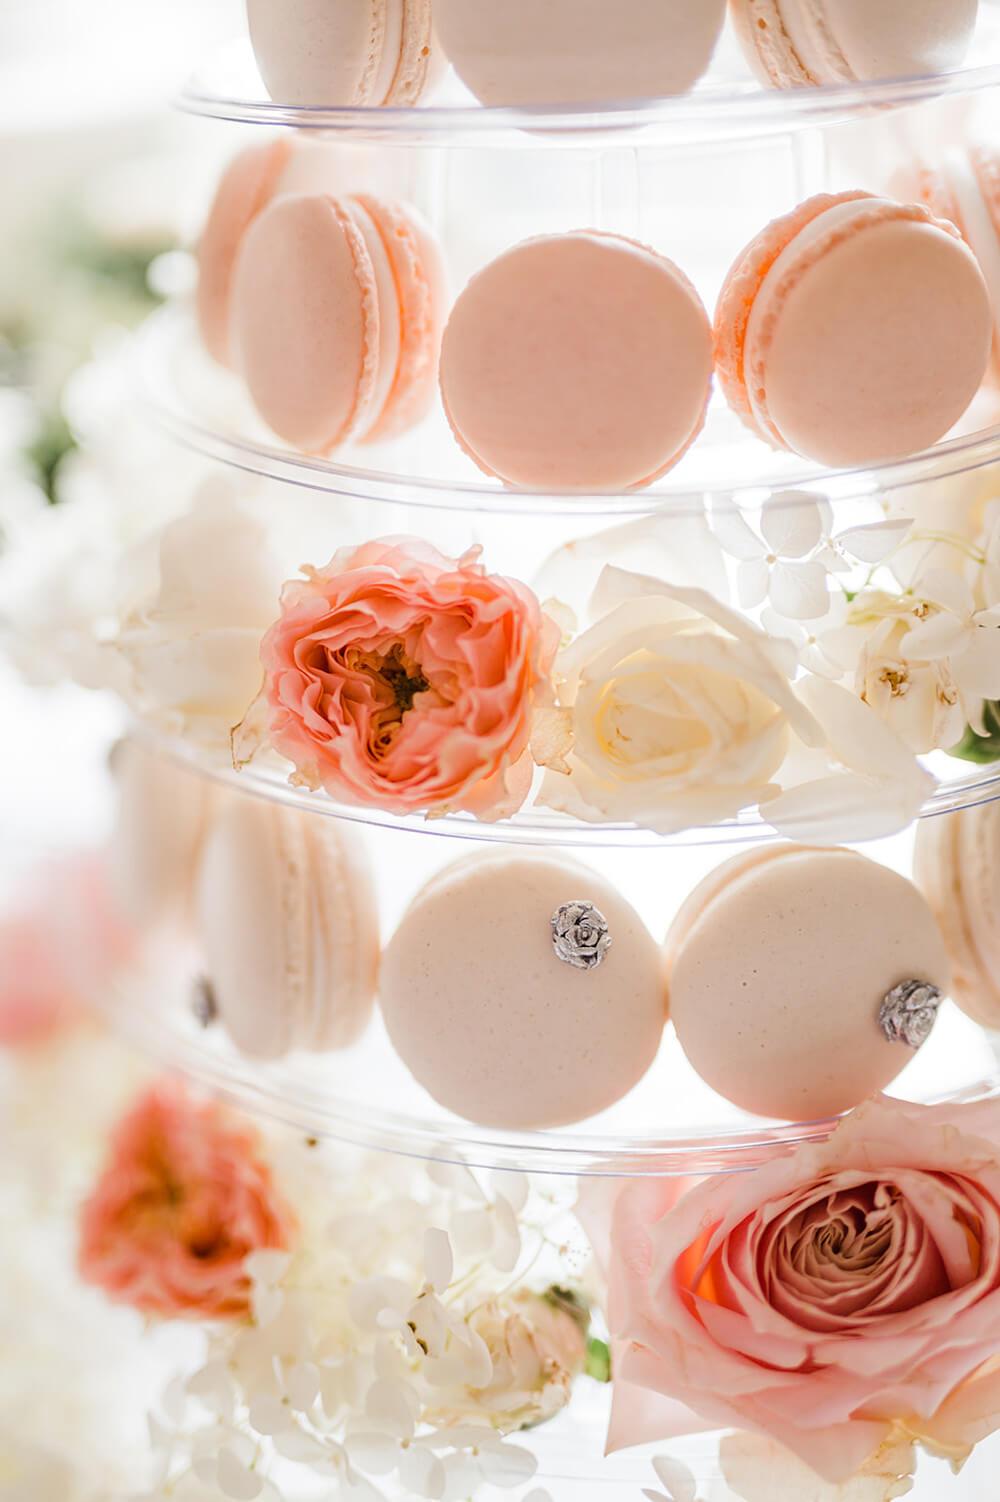 Rosa Macarons mit Rosendeko – gesehen bei frauimmer-herrewig.de